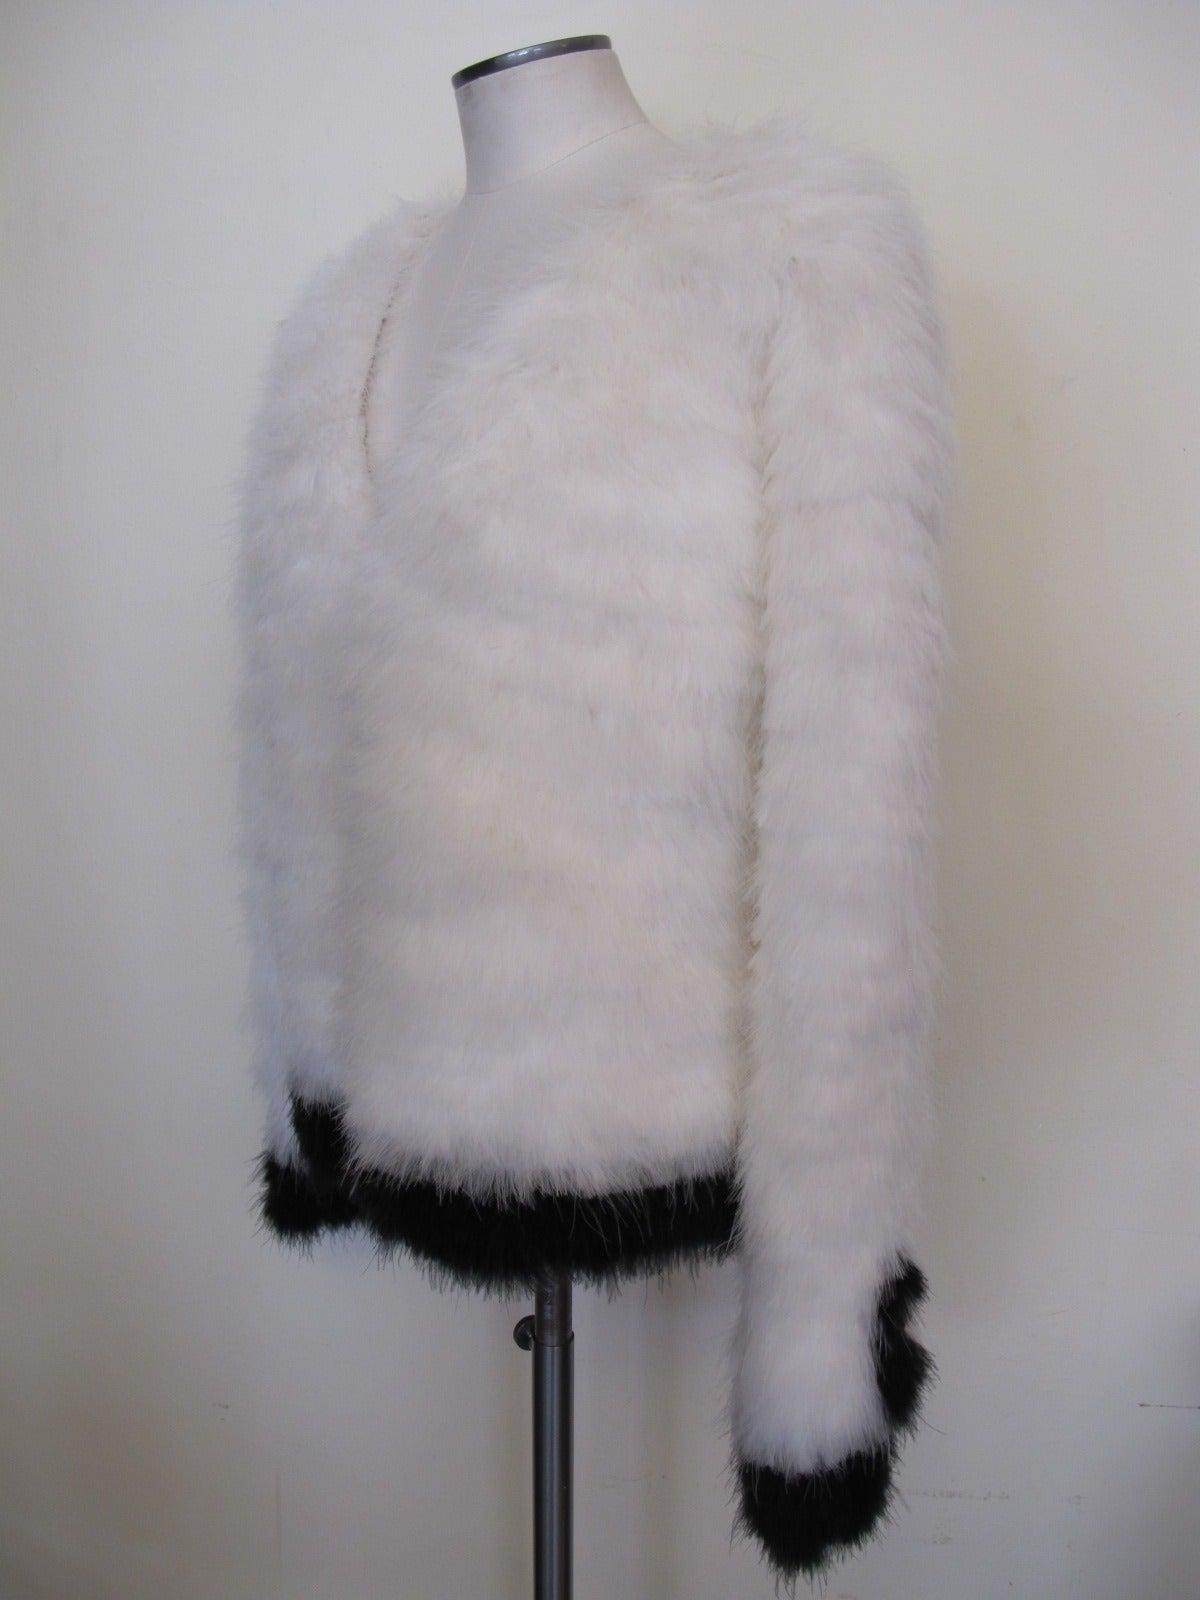 Tom Ford New Luxurious Marabou Jacket 2012 3